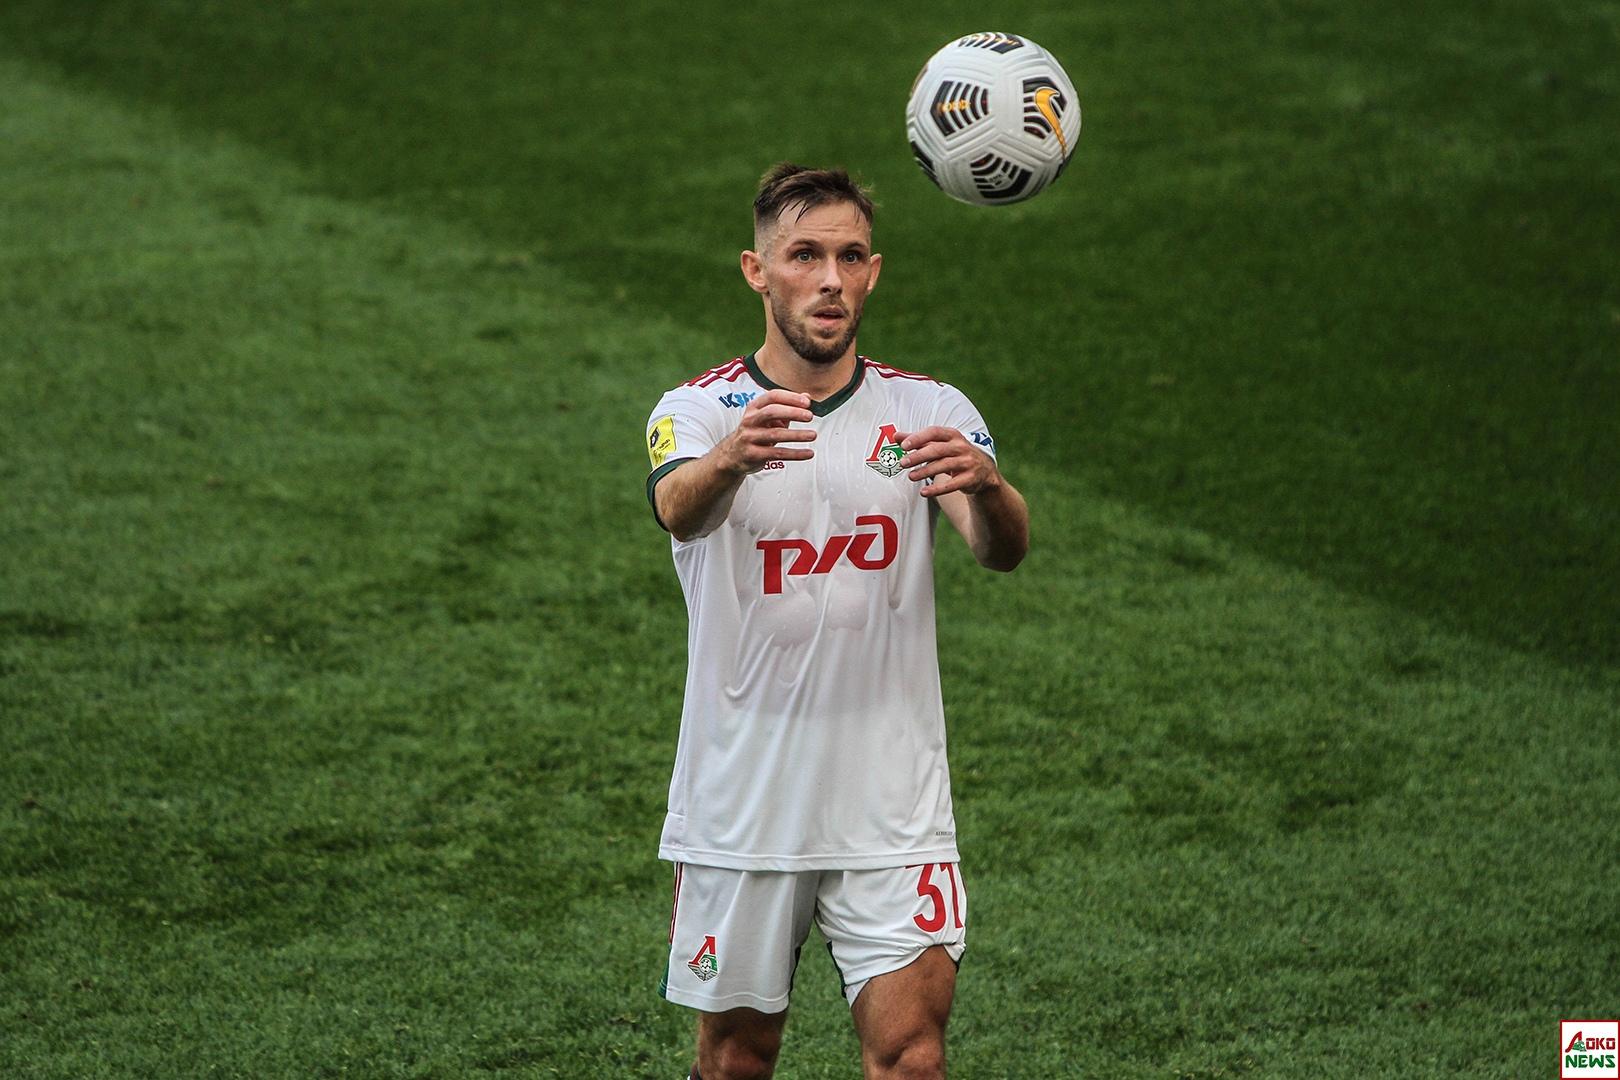 Локомотив - Зенит. Фото: Дмитрий Бурдонов / Loko.News